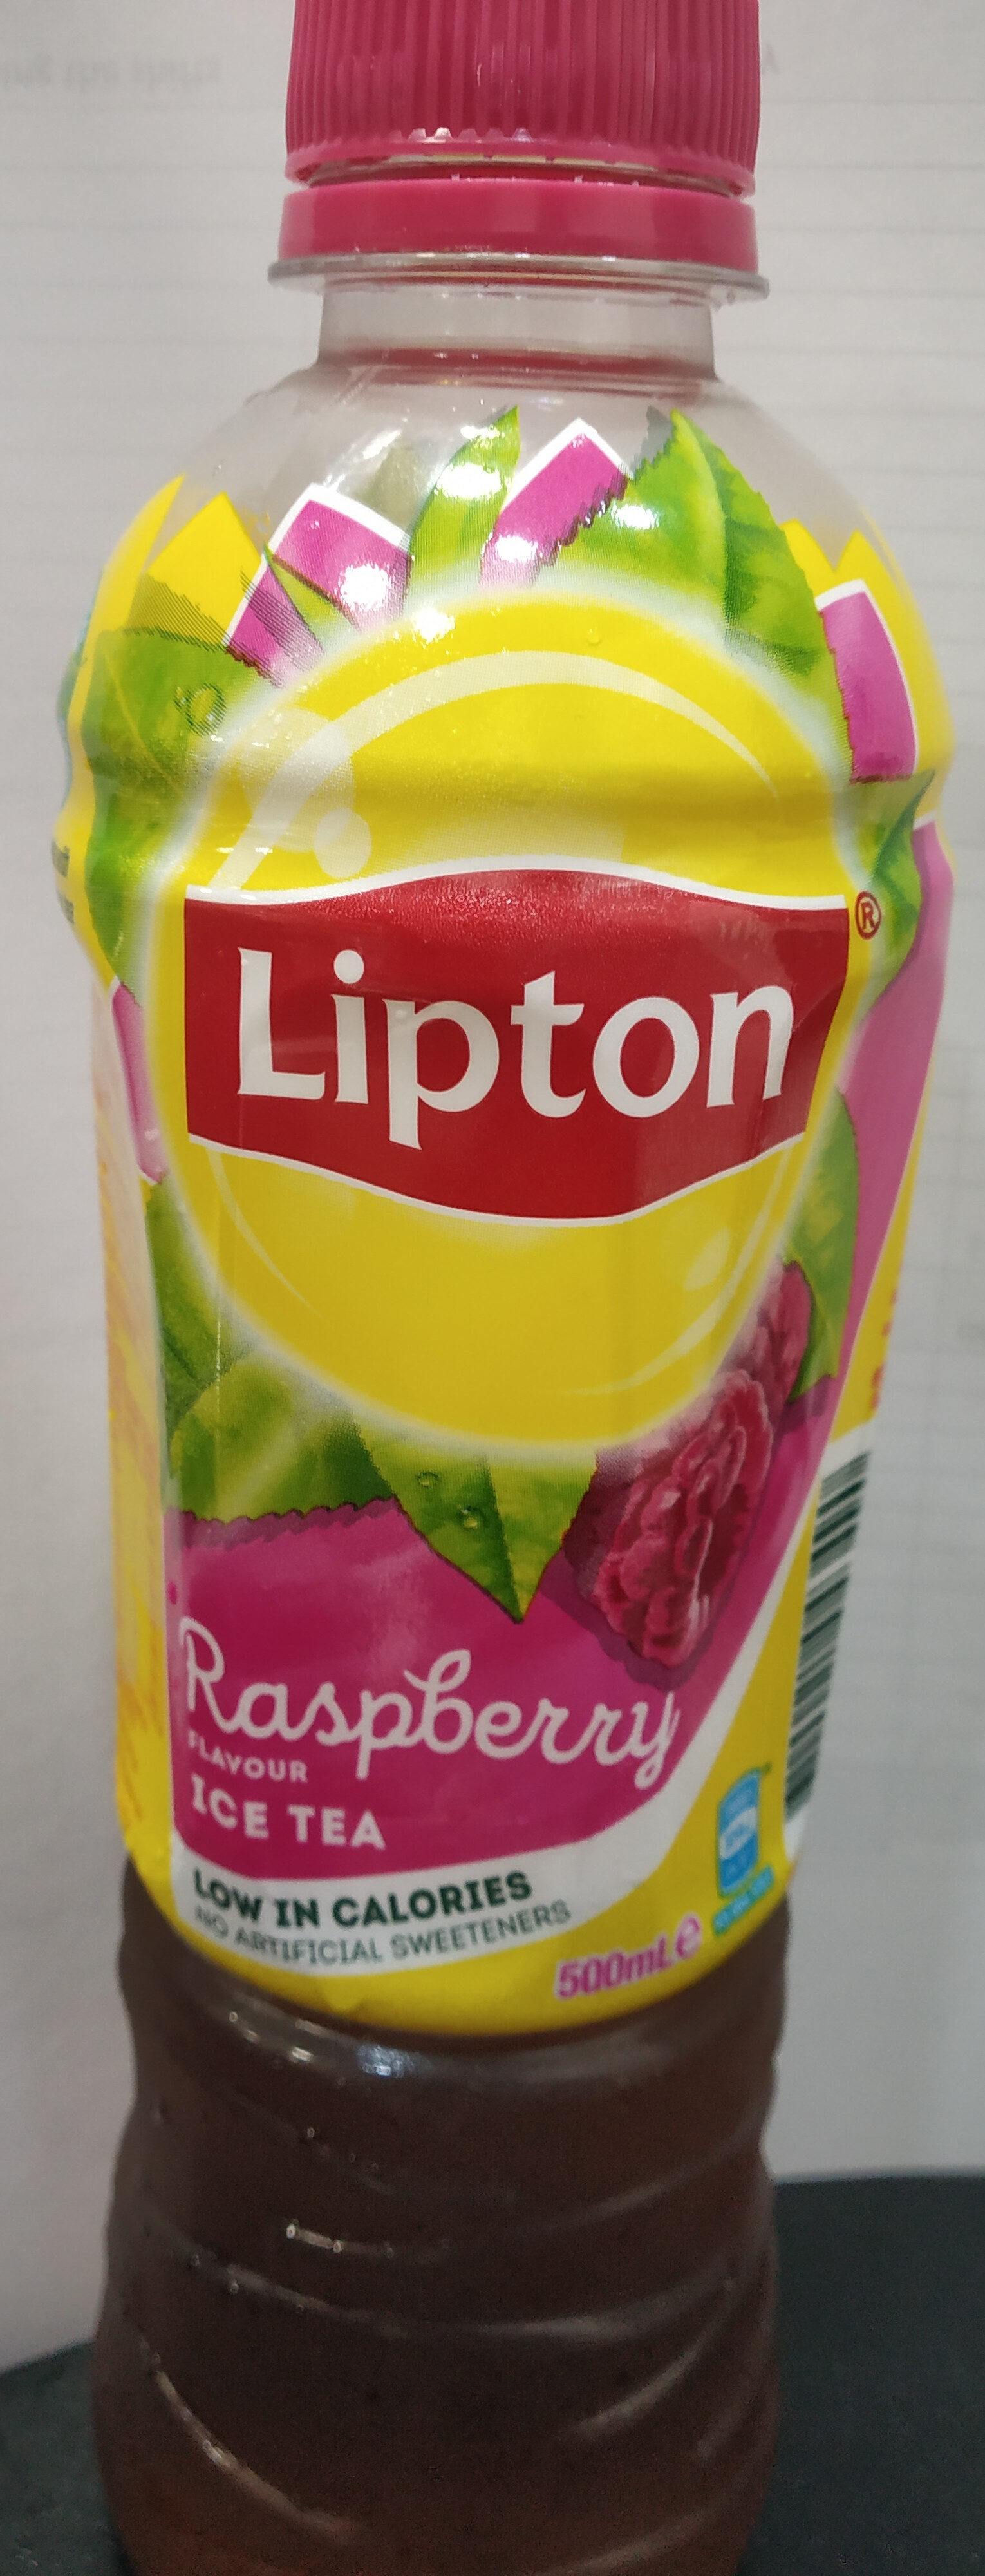 Raspberry Tea - Product - en